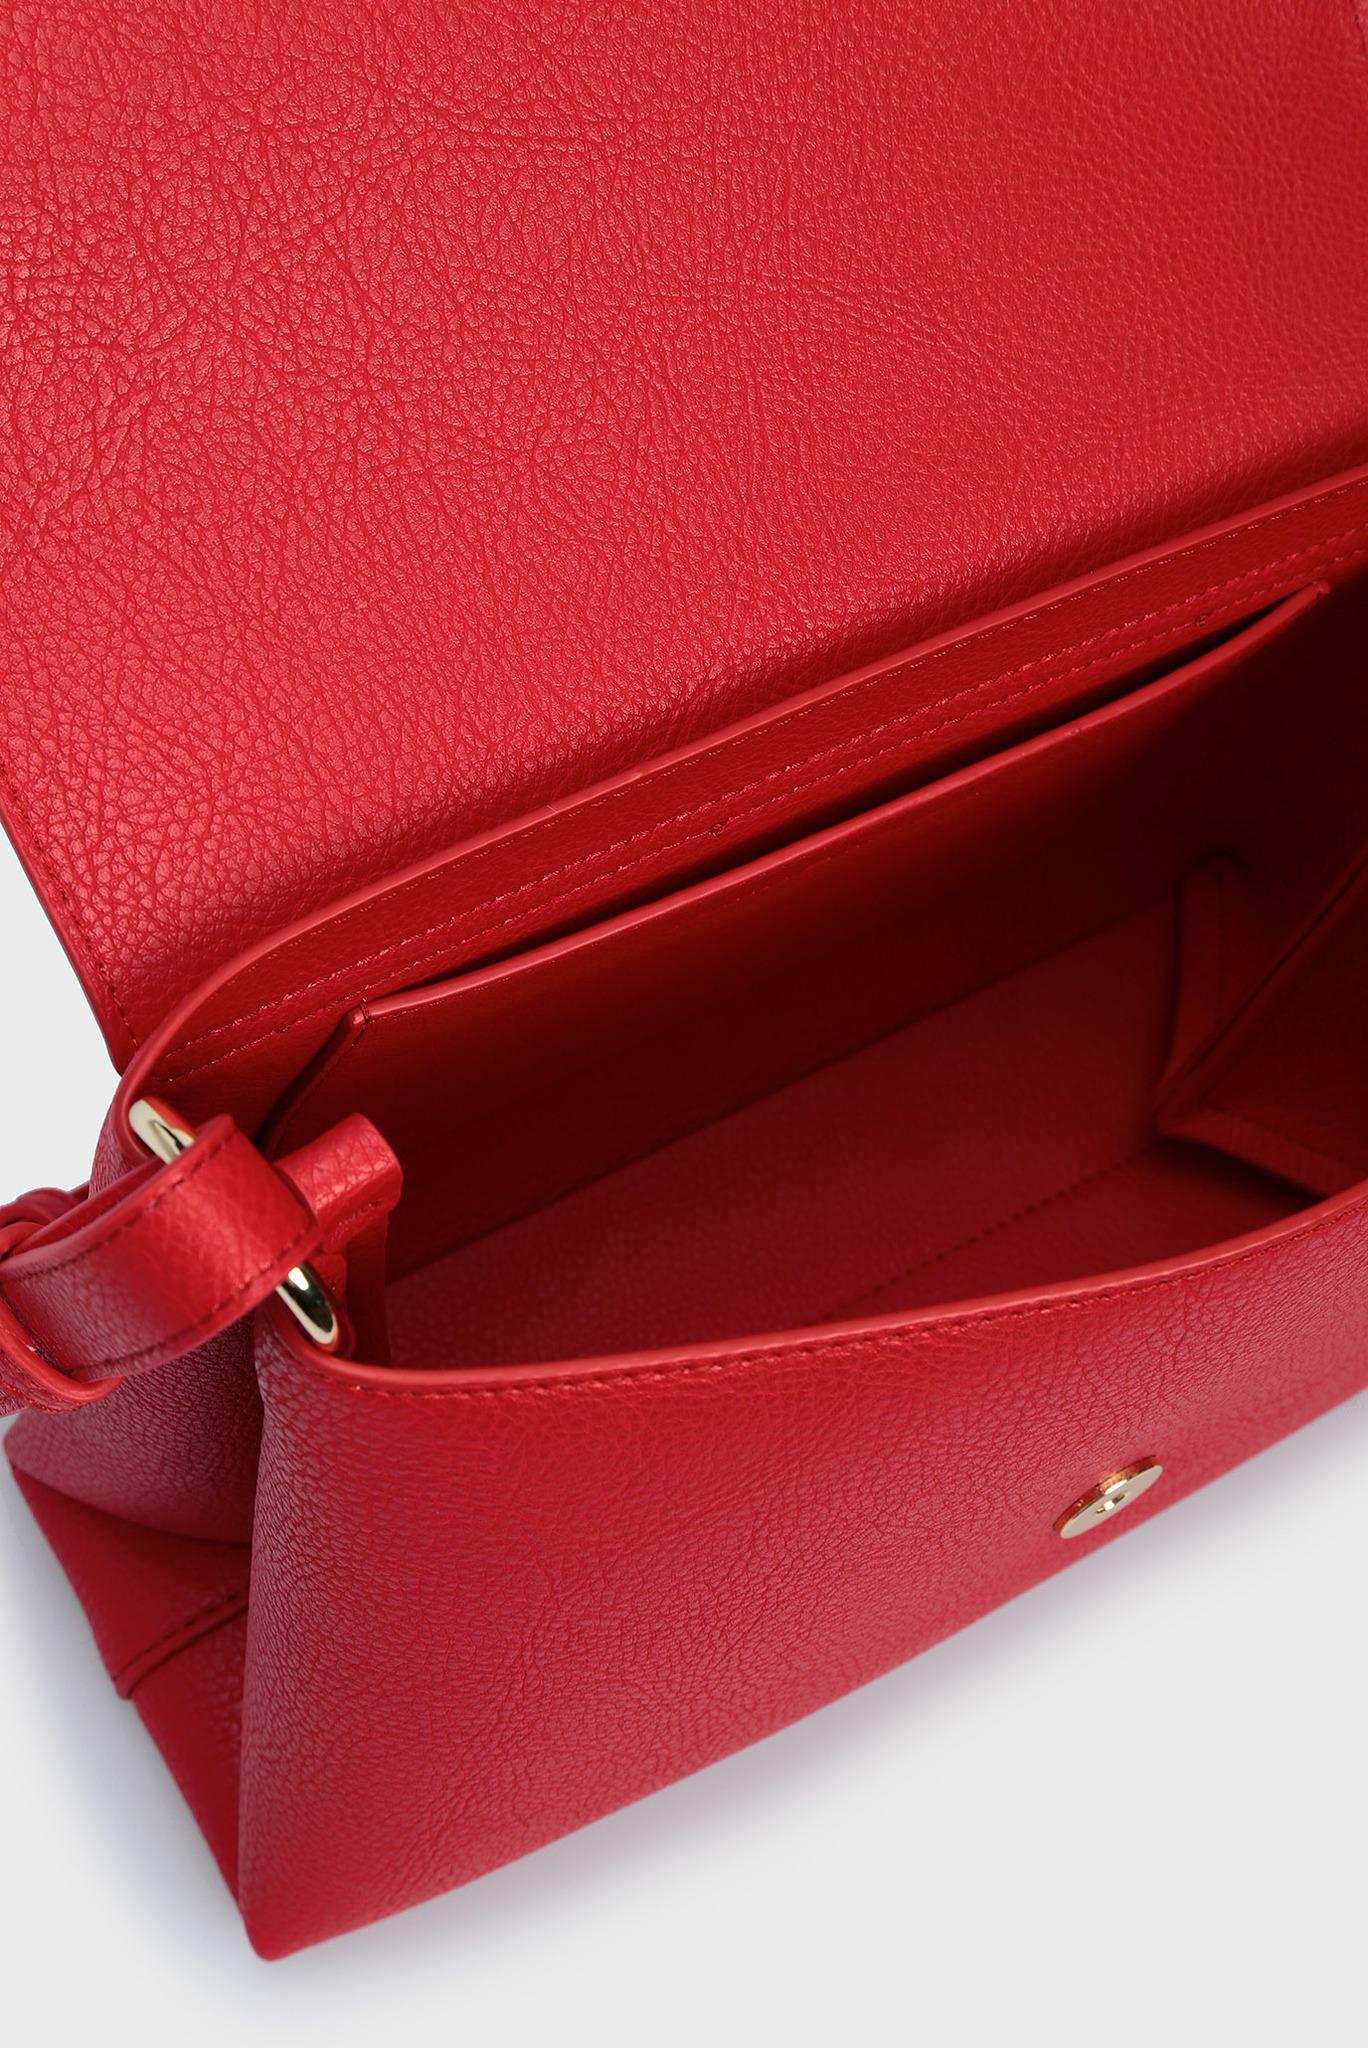 Женская красная сумка через плечо TH CORE FLAP Tommy Hilfiger